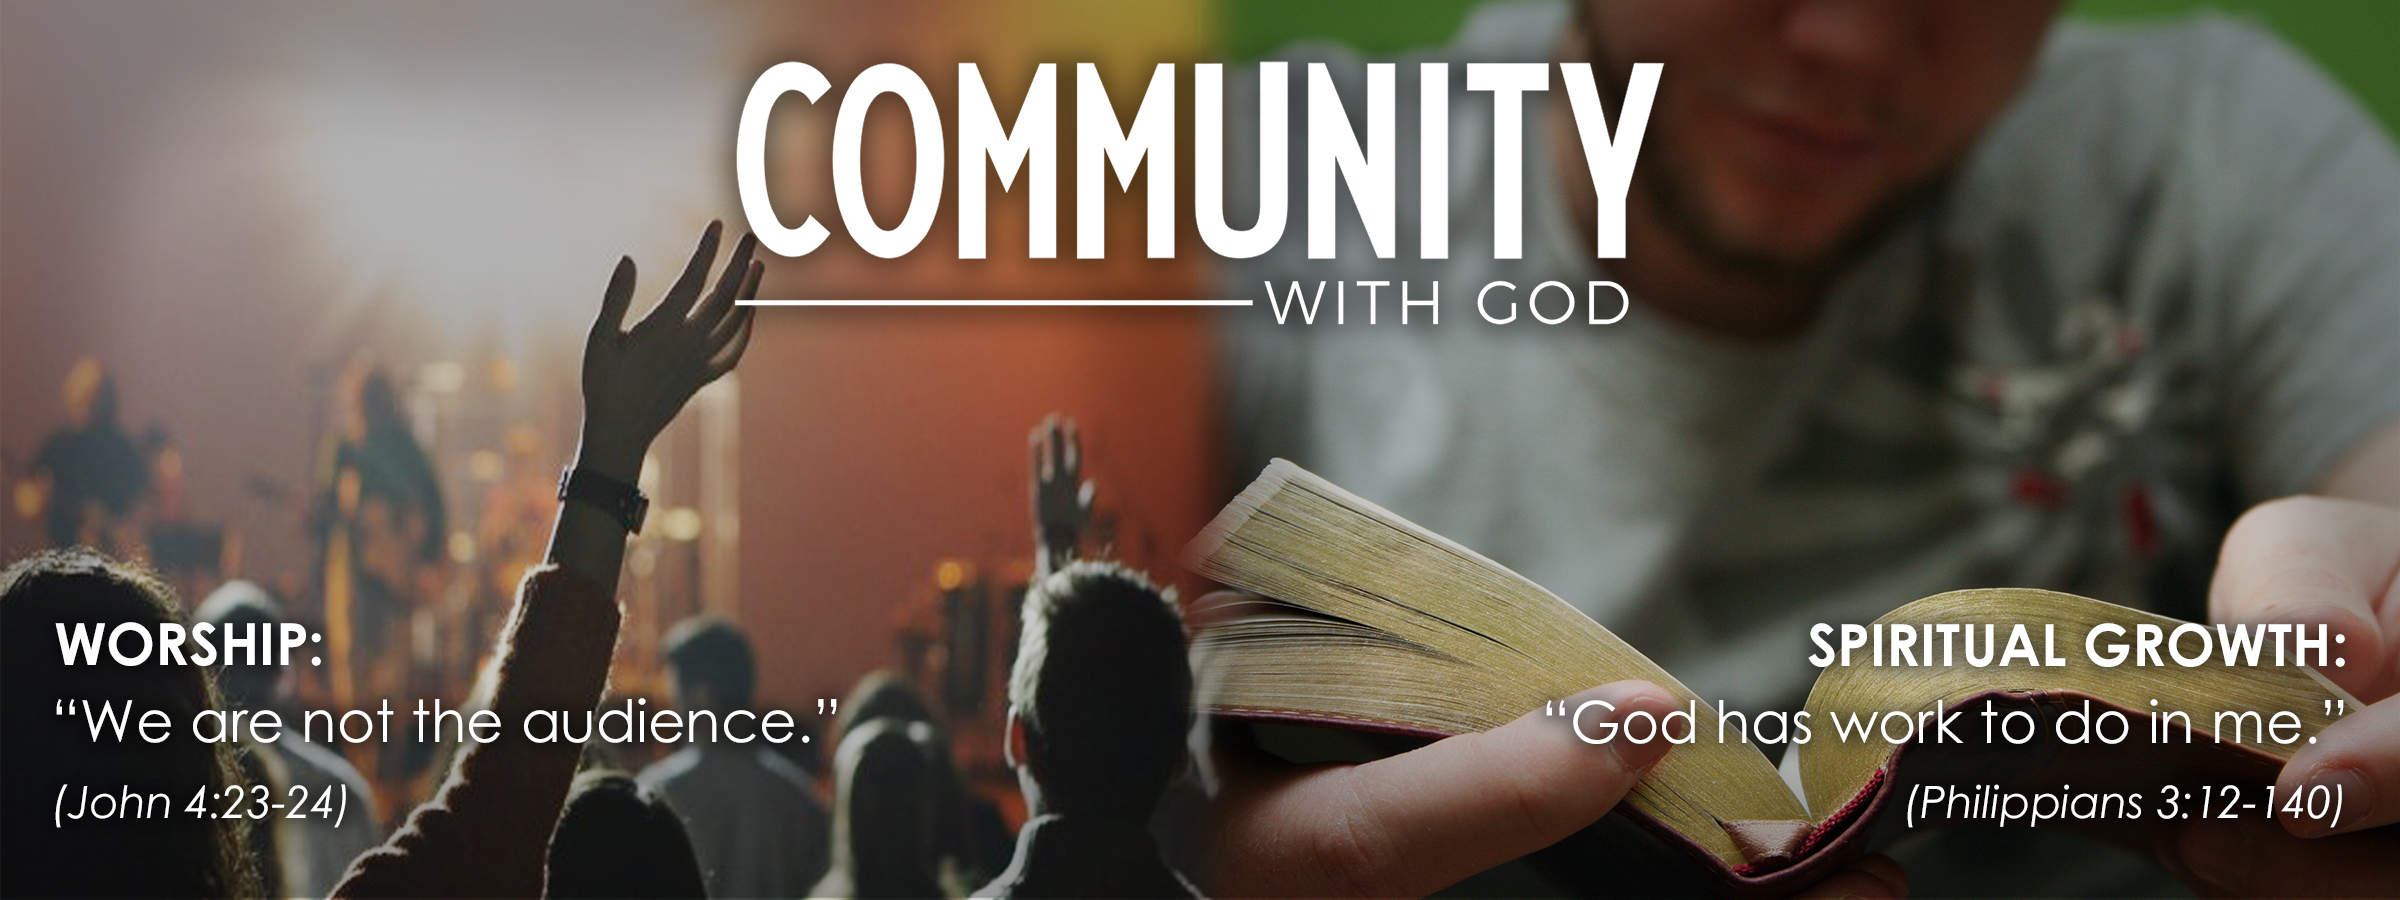 Community wGOD 2wide.jpg